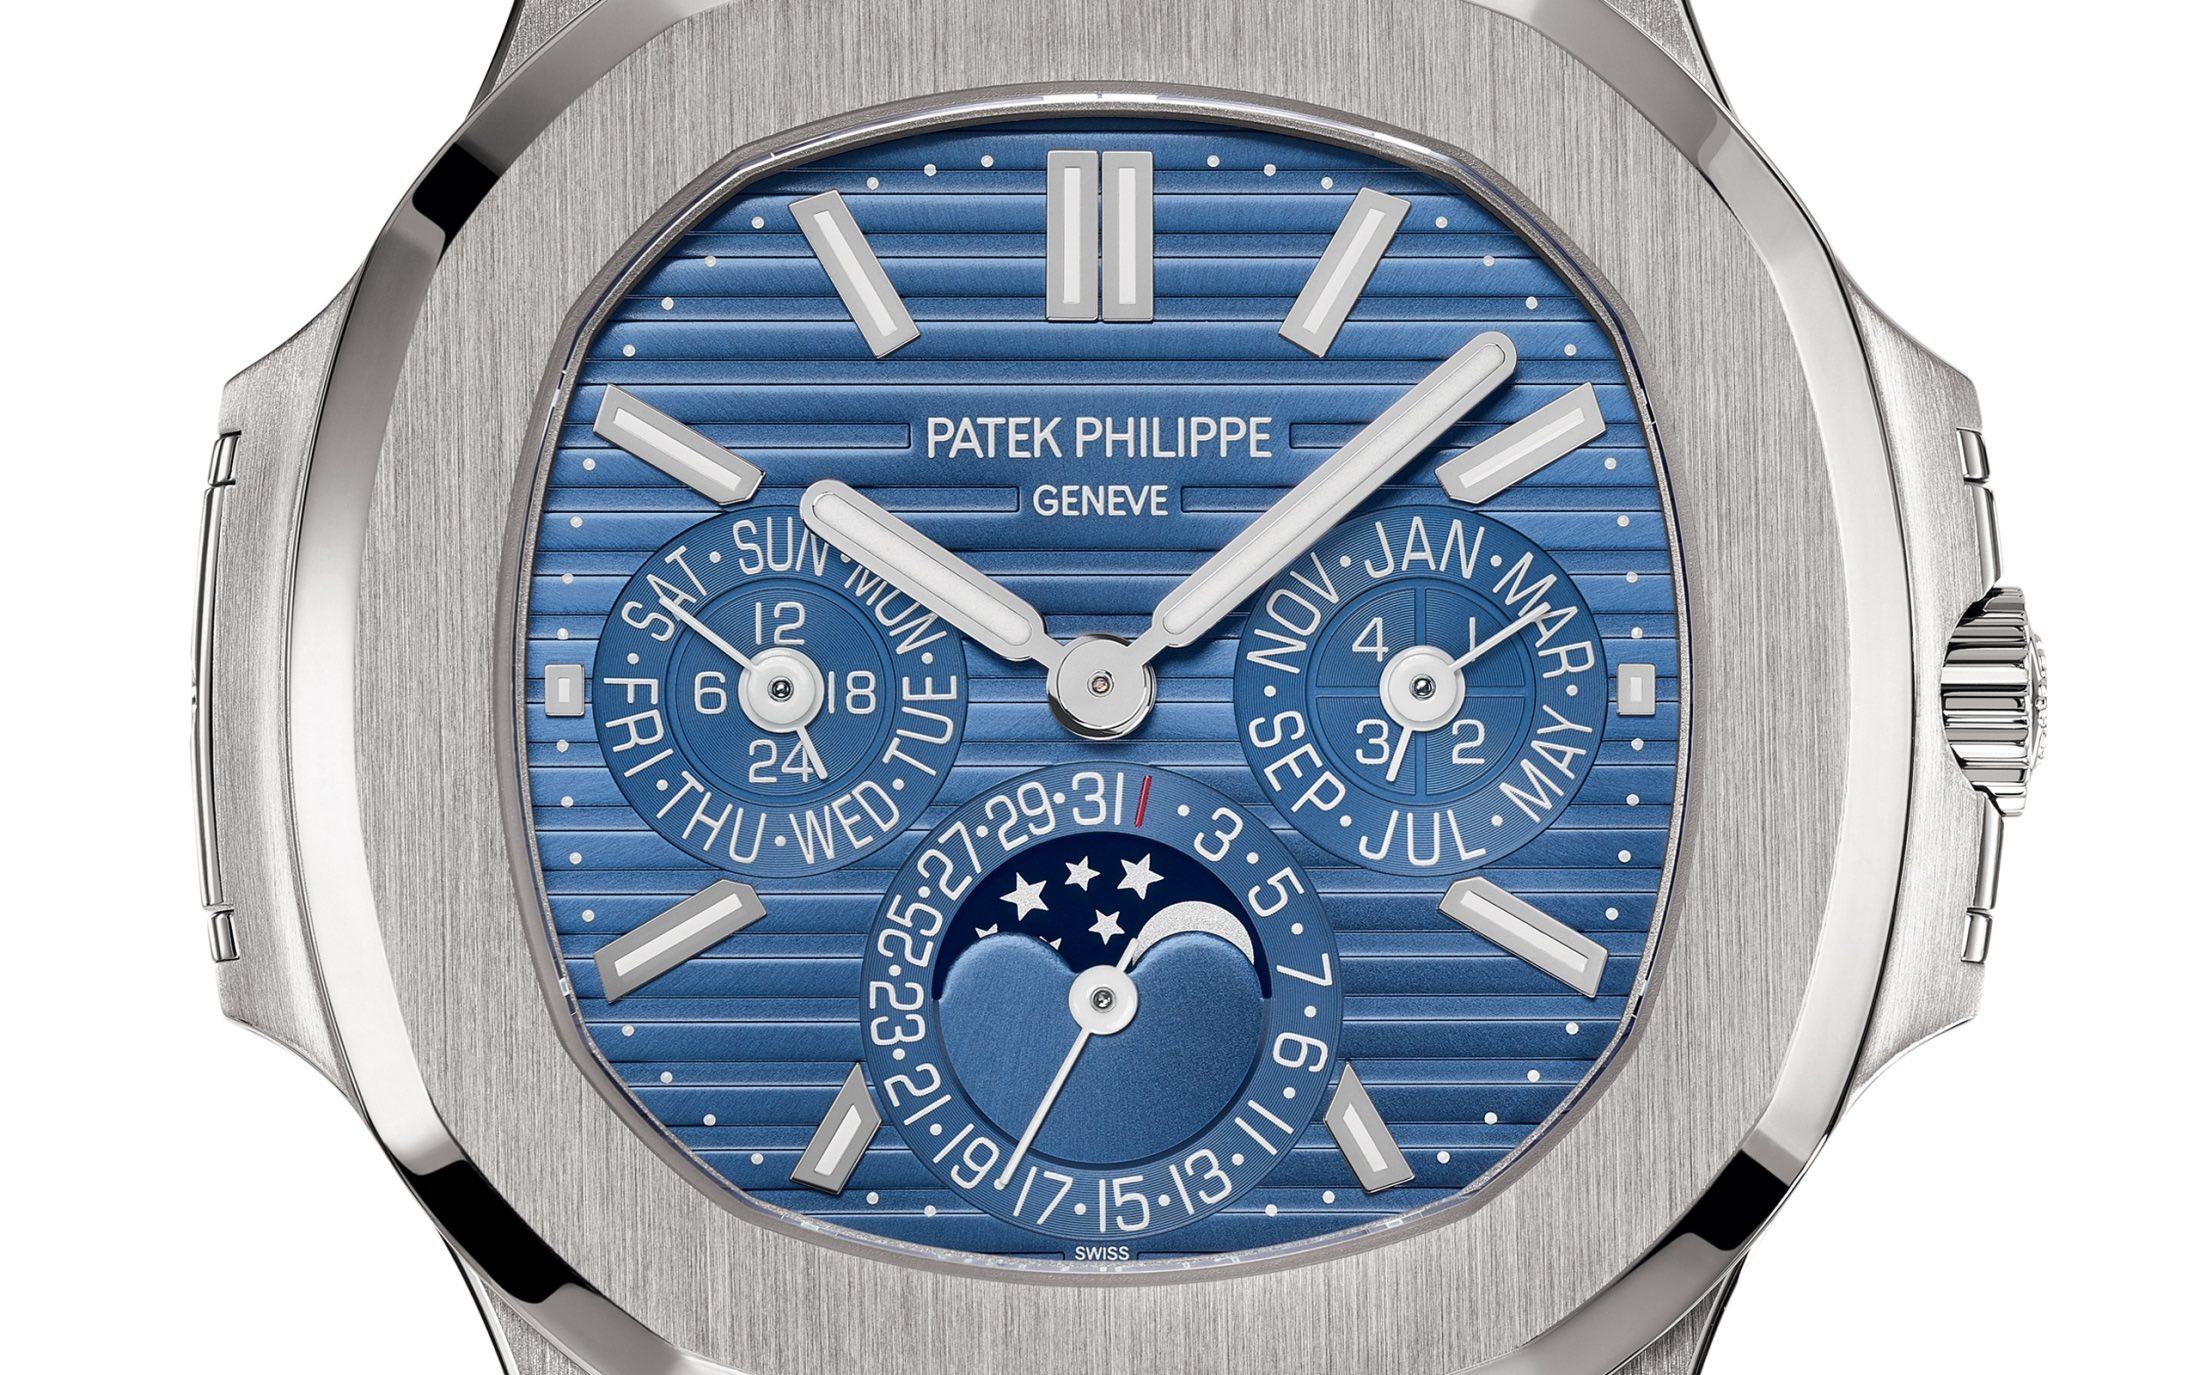 Patek-Philippe-Nautilus-Perpetual-Calendar-5740G-Baselworld-2018-4.jpeg